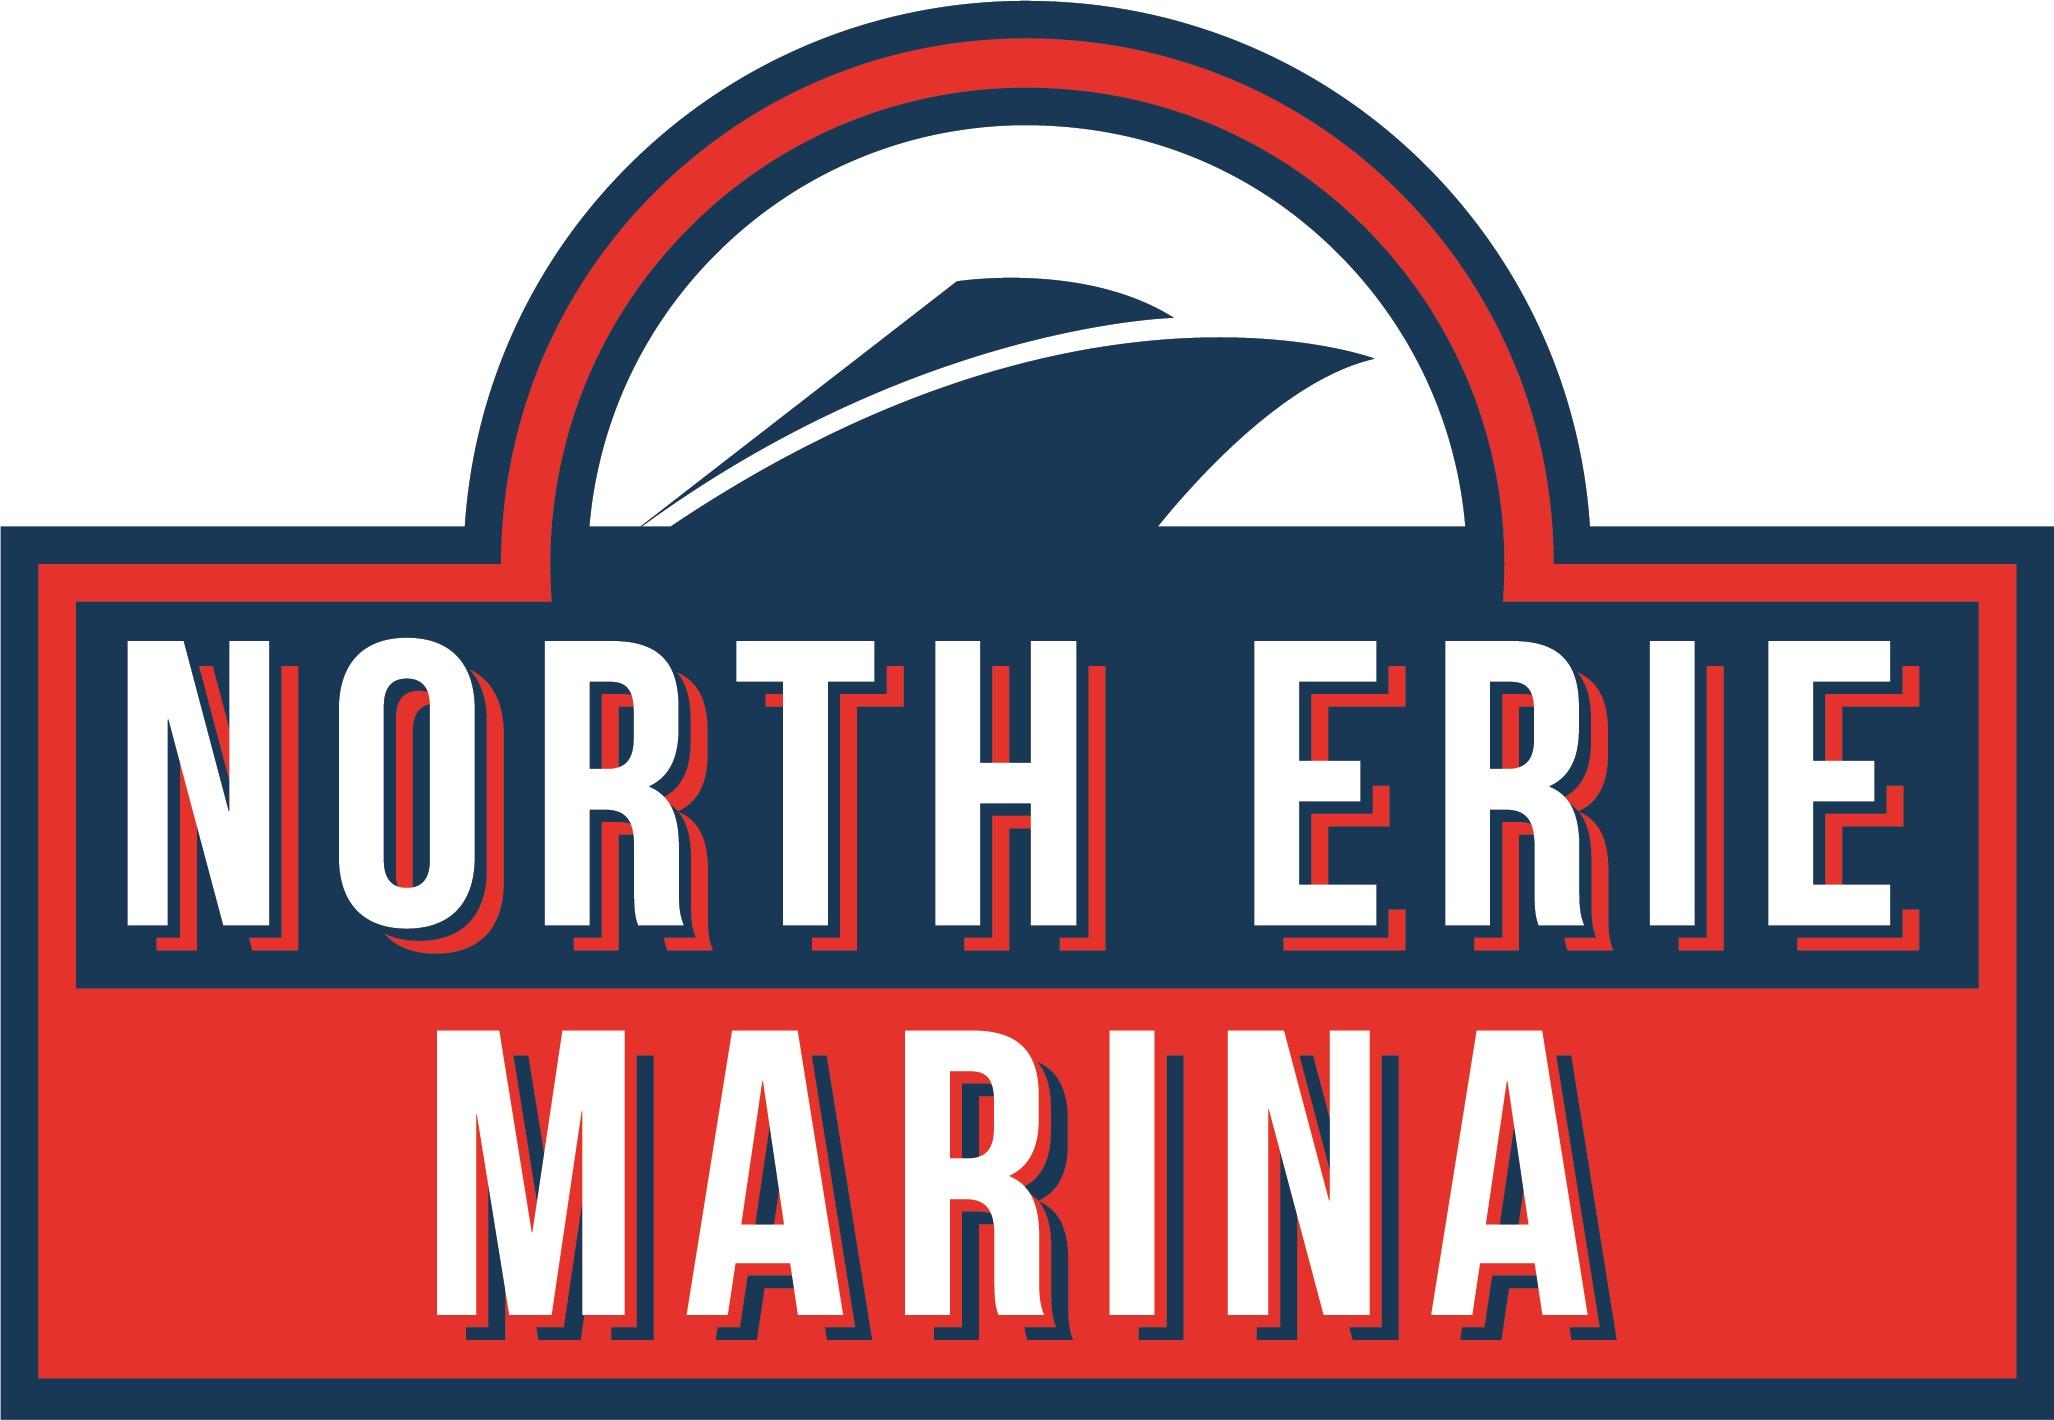 North Erie Marina